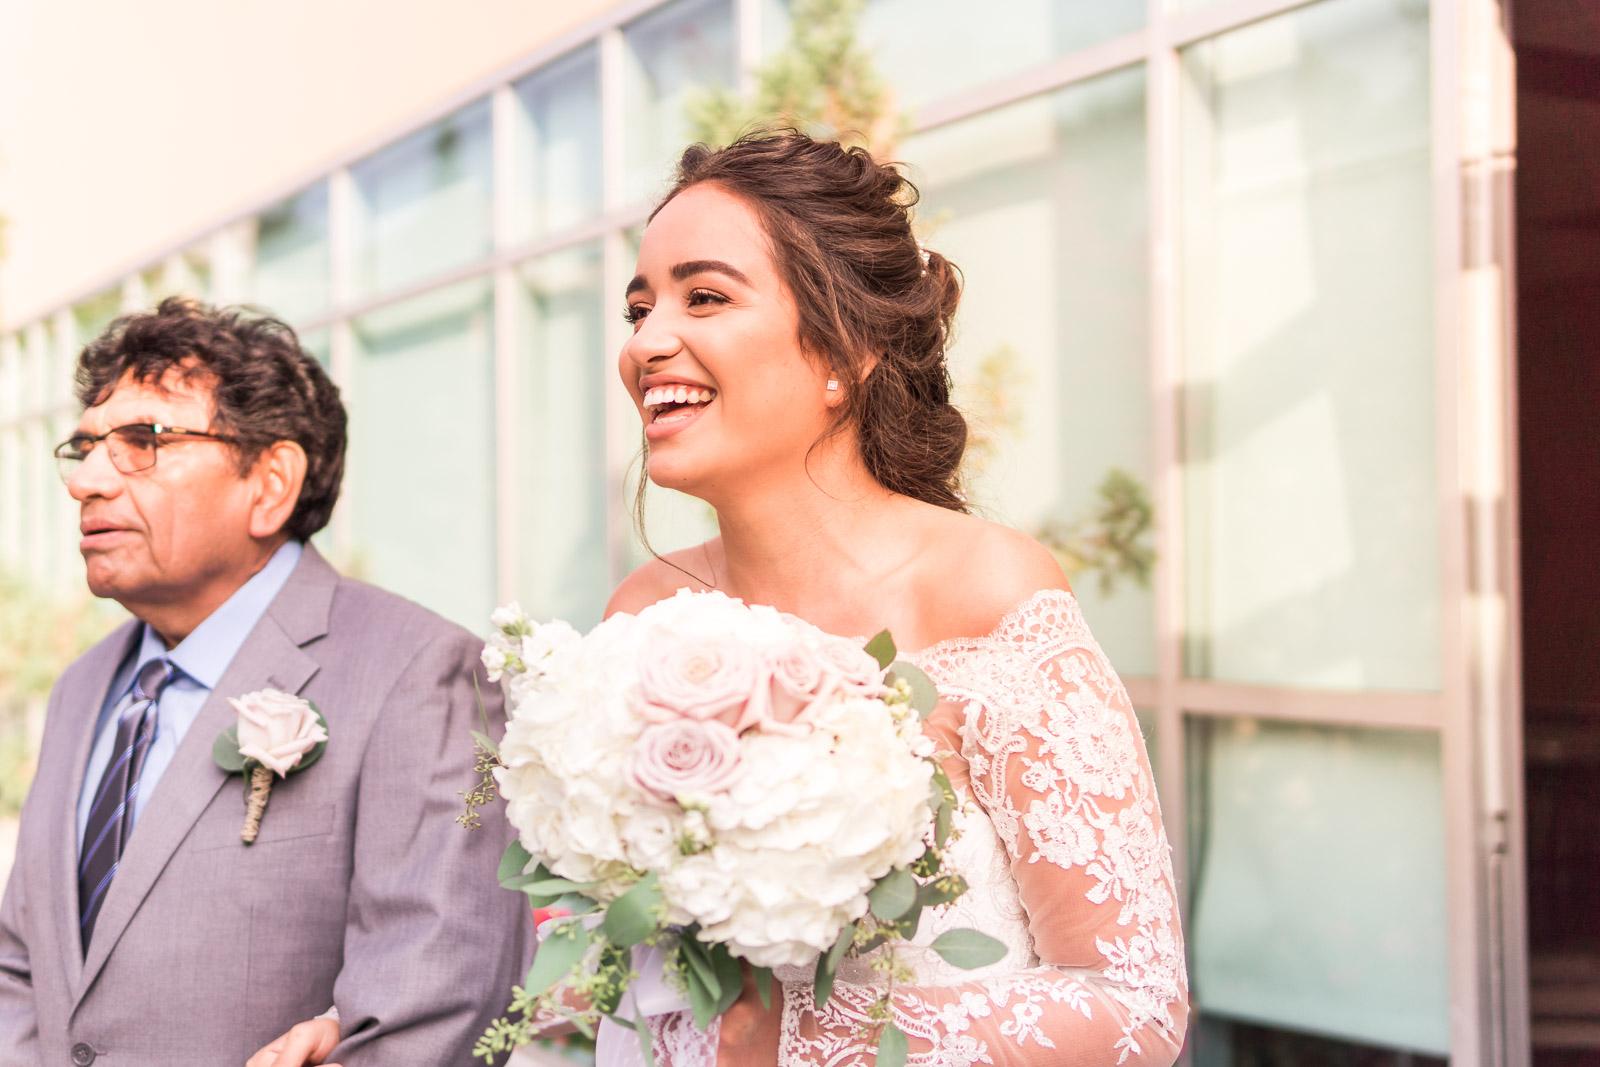 144_Angel-Brea-Orange-County_Joseph-Barber-Wedding-Photography.jpg